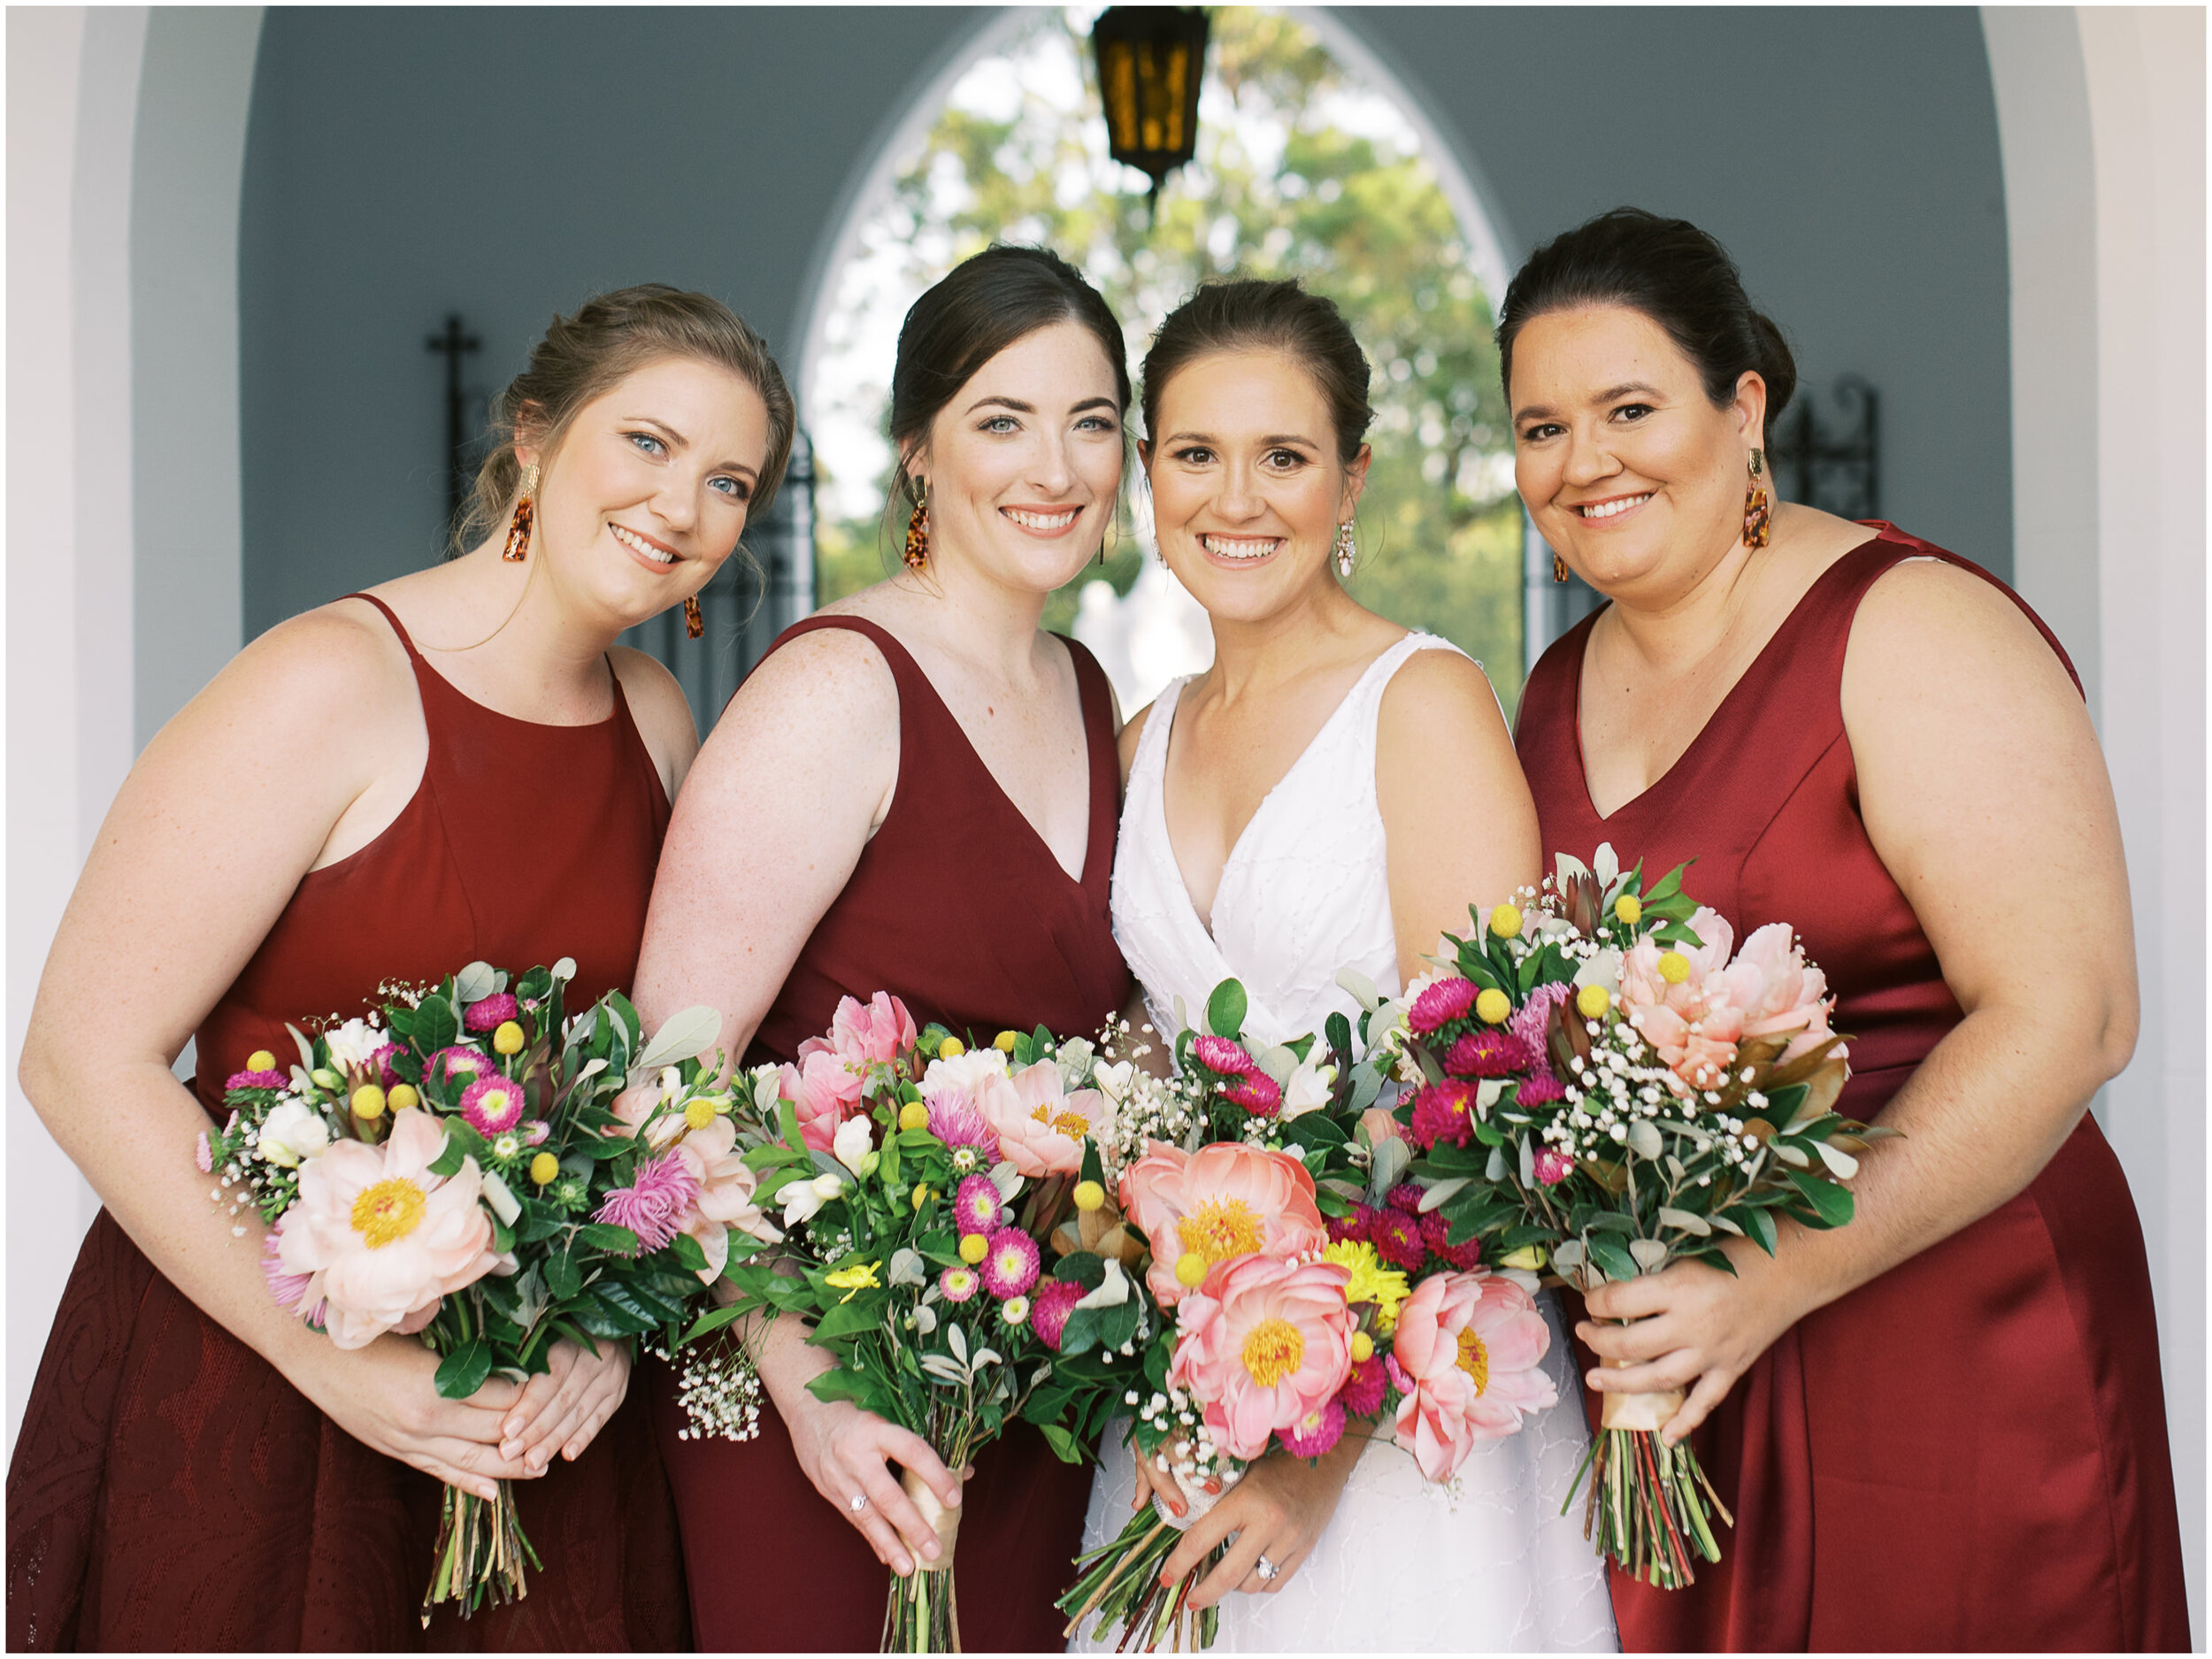 fine-art-australian-destination-wedding-photographer-23.jpg